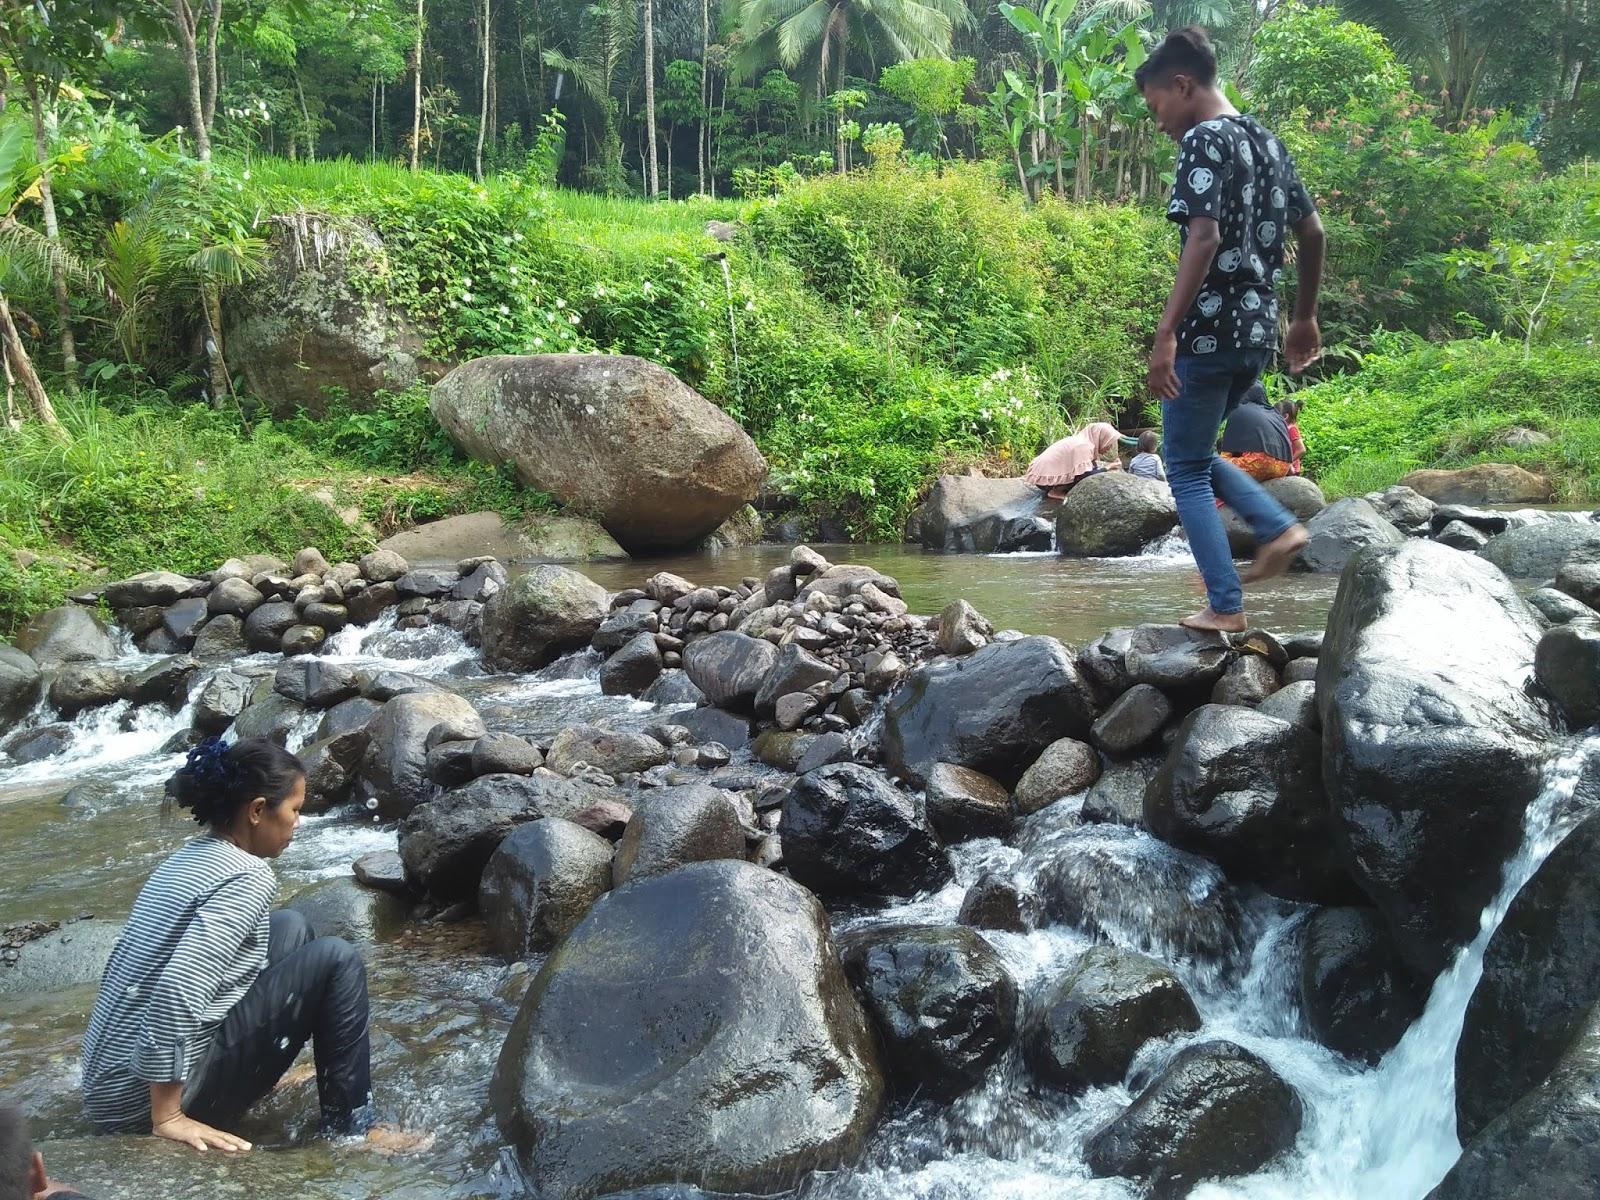 Indahnya Wisata Alam Sungai Cireong Desa Sukaresik Sindangkasih